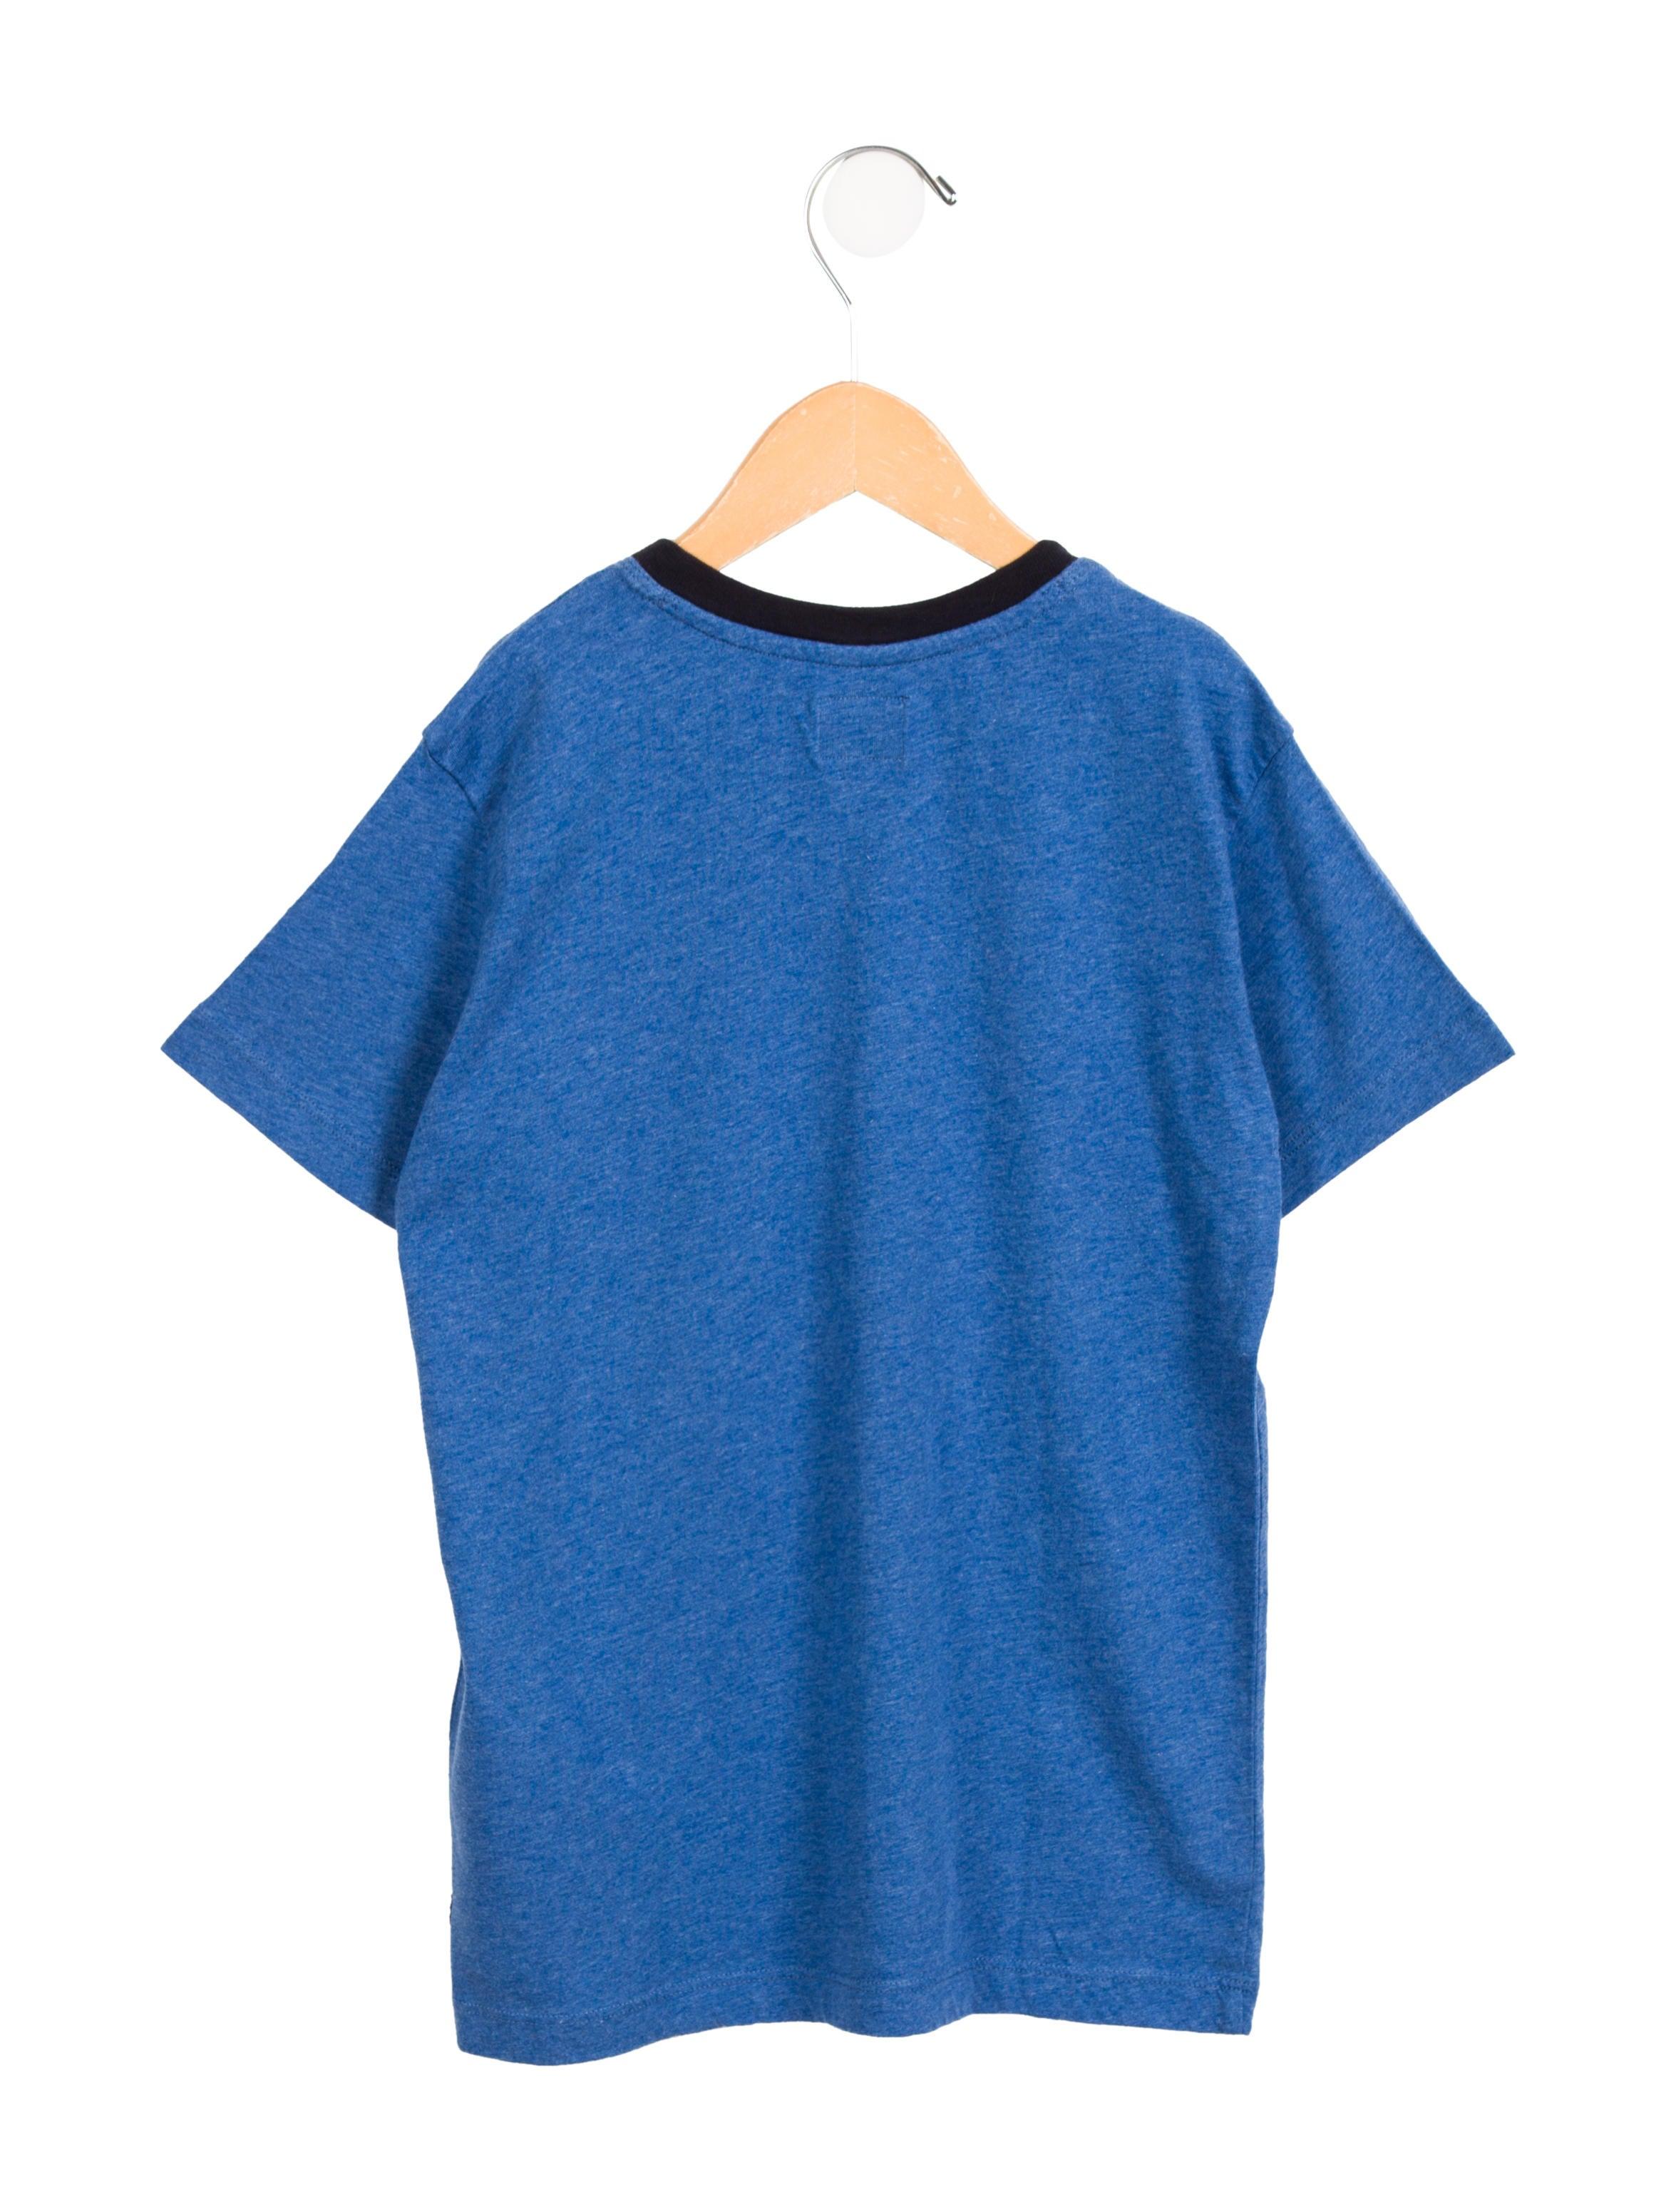 Armani junior boys 39 printed short sleeve t shirt boys for Boys printed t shirts